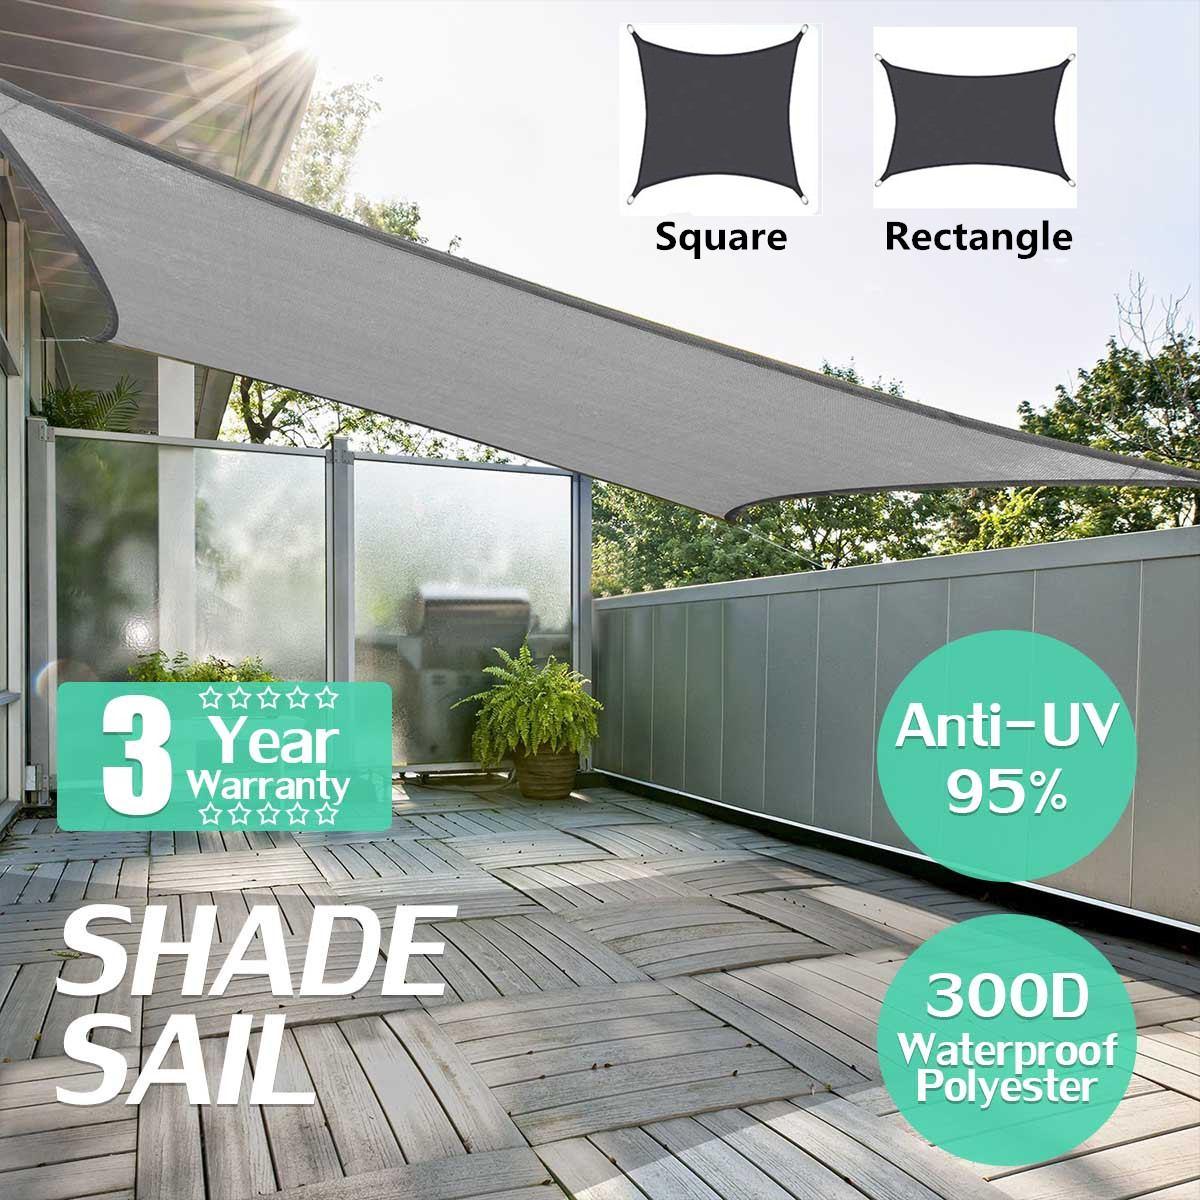 Waterproof 300D Black Square Rectangle Shade Sail garden terrace Canopy swimming Sun shade Camping Hiking Yard sail awnings(China)